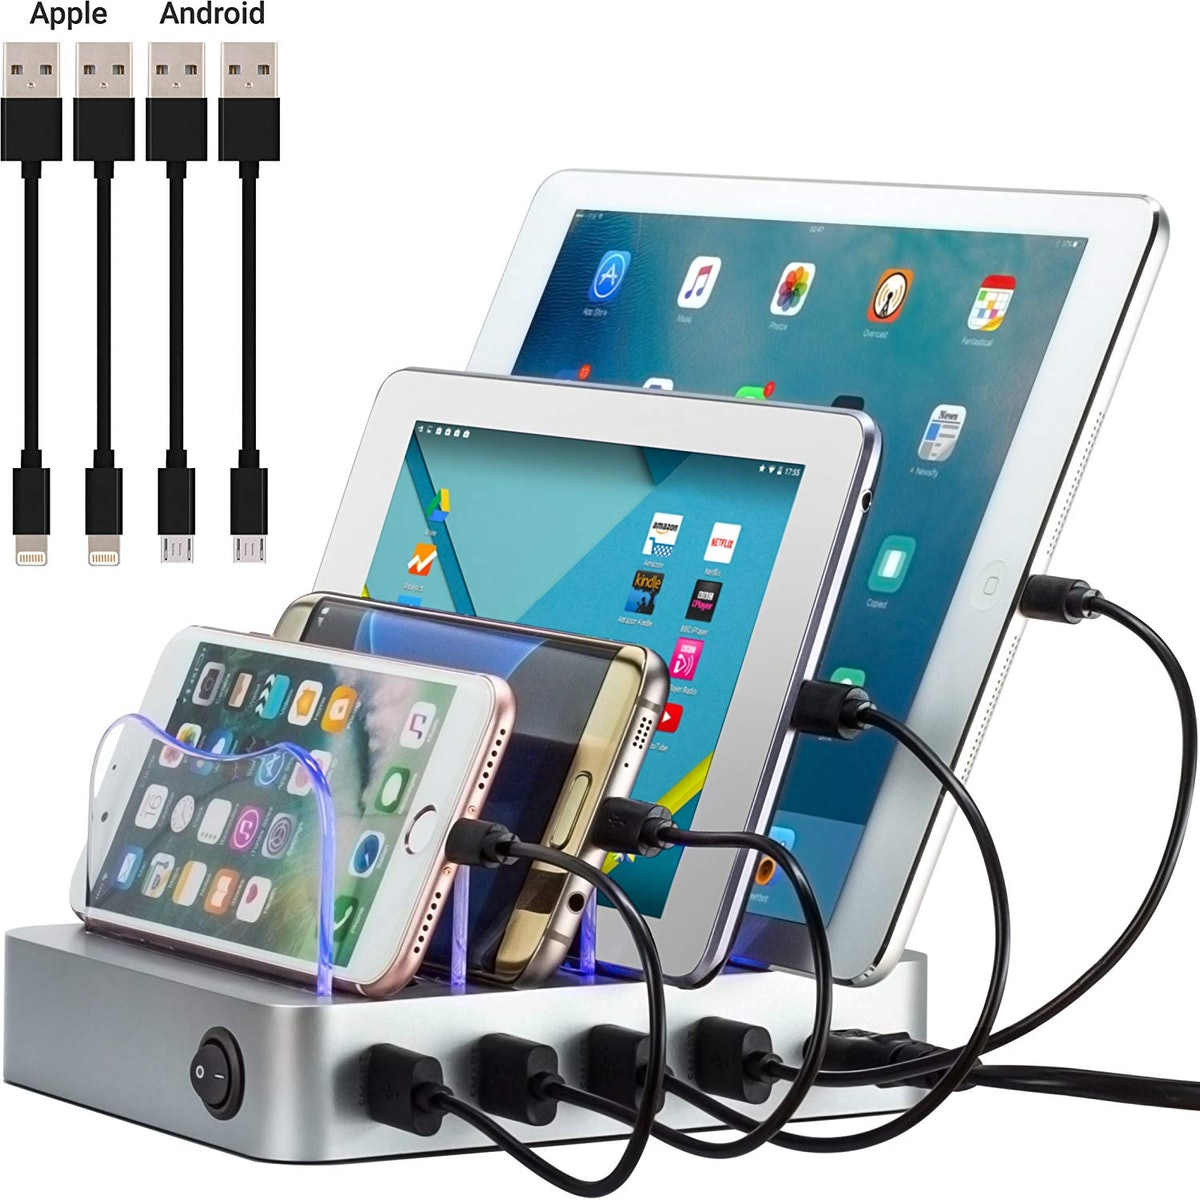 Simicore Smart Charging Station